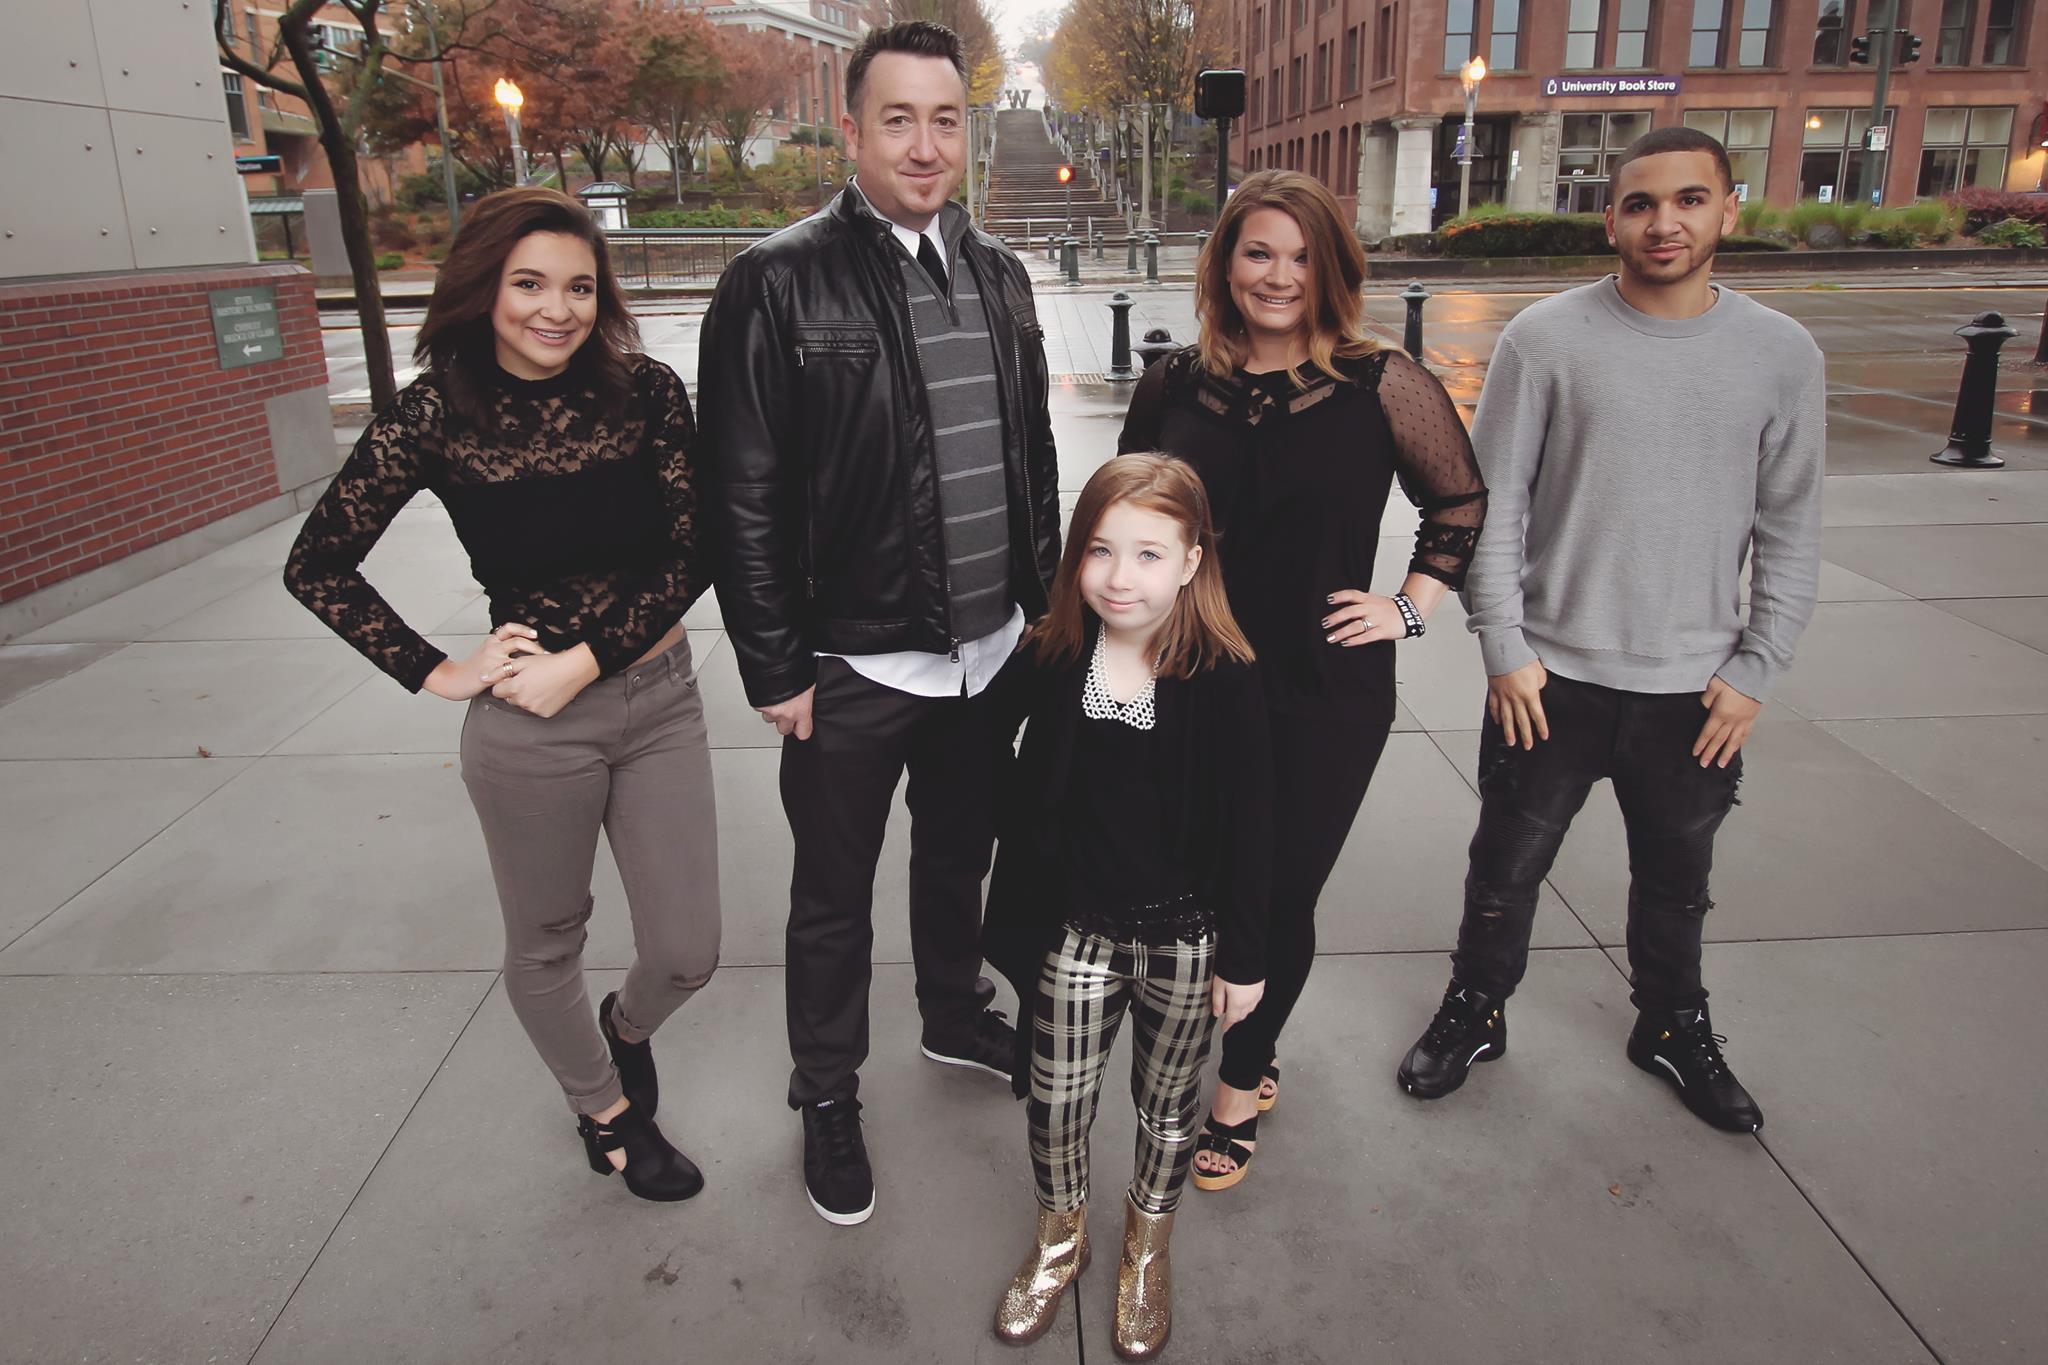 The Wharton Family